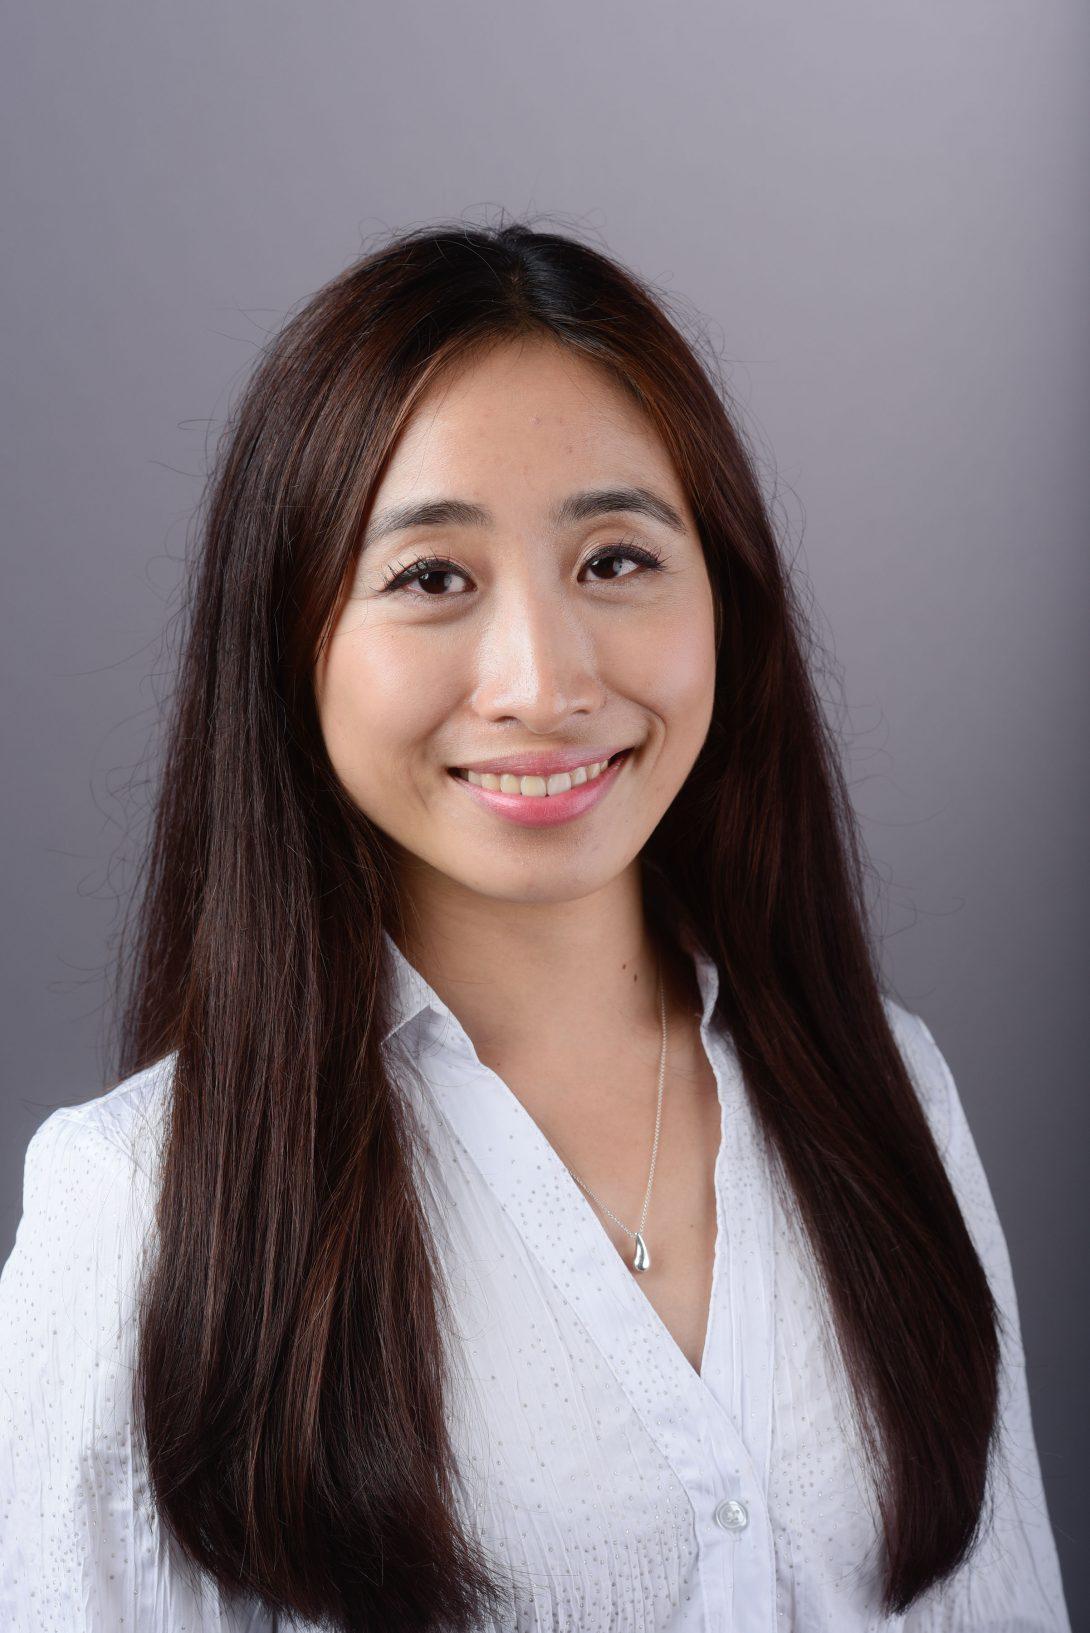 portrait of Dr. Hsuan Tsuei